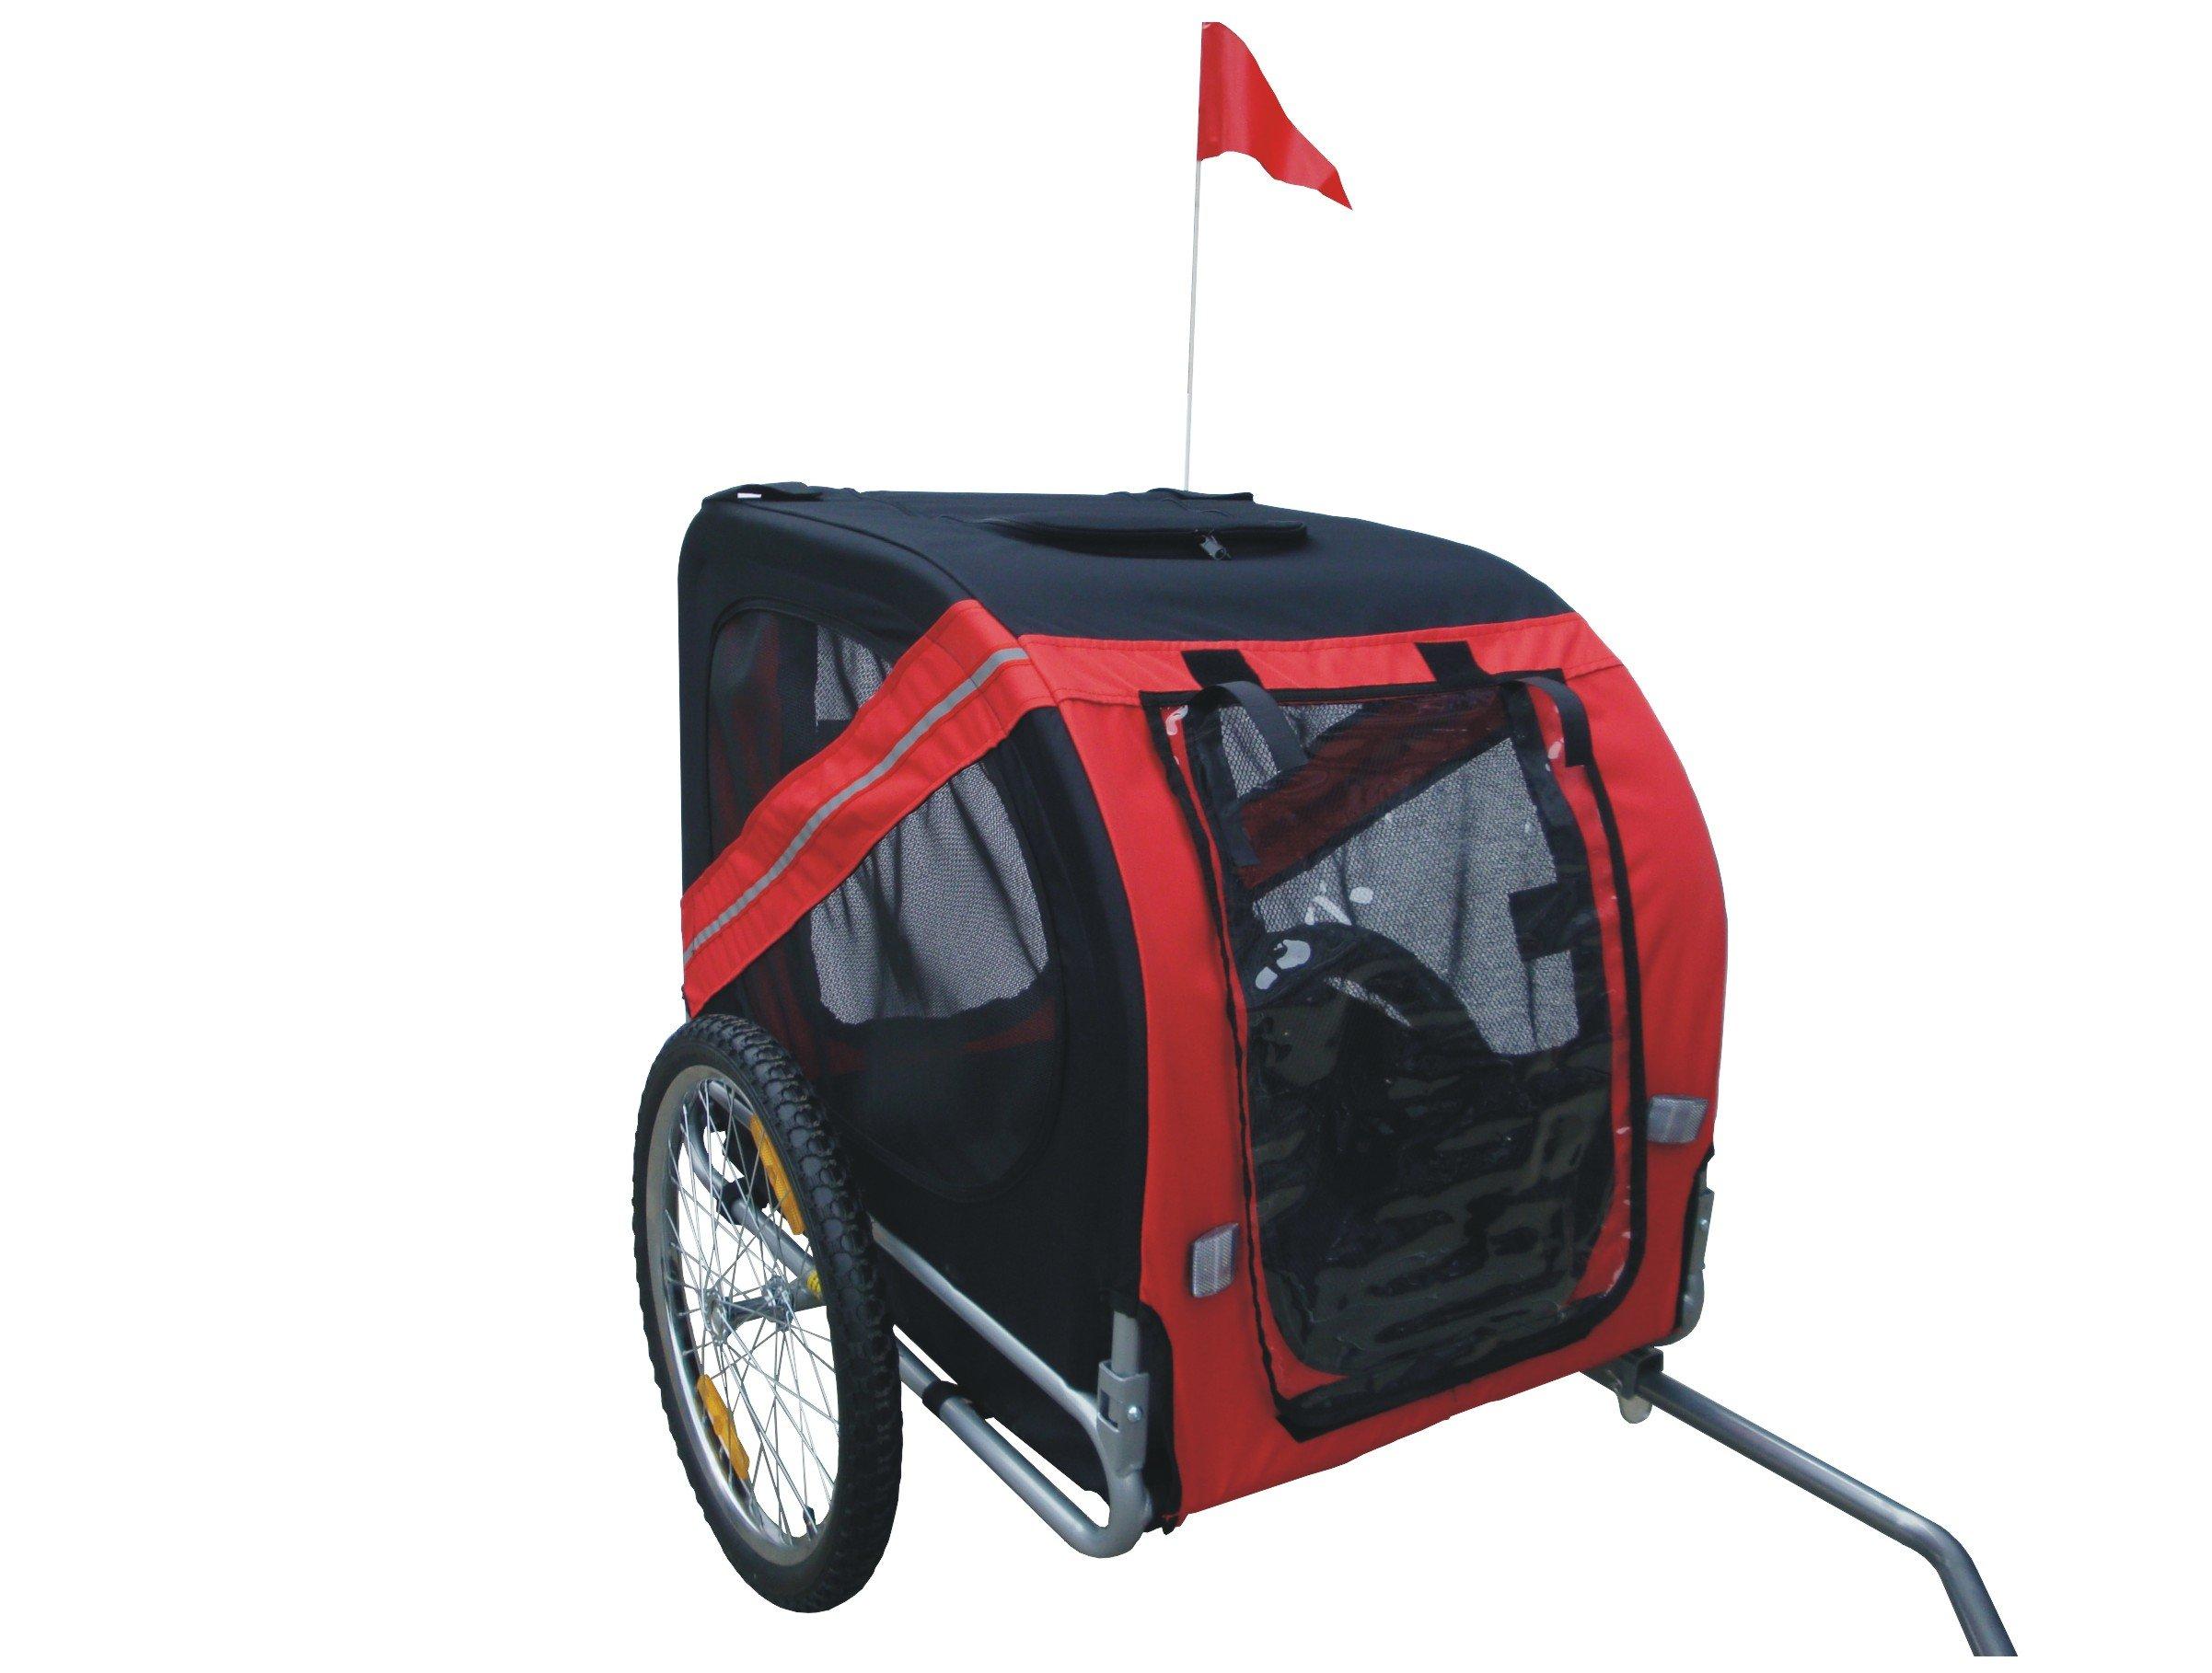 MDOG2 MK0062A Comfy Pet Bike Trailer, Red/Black